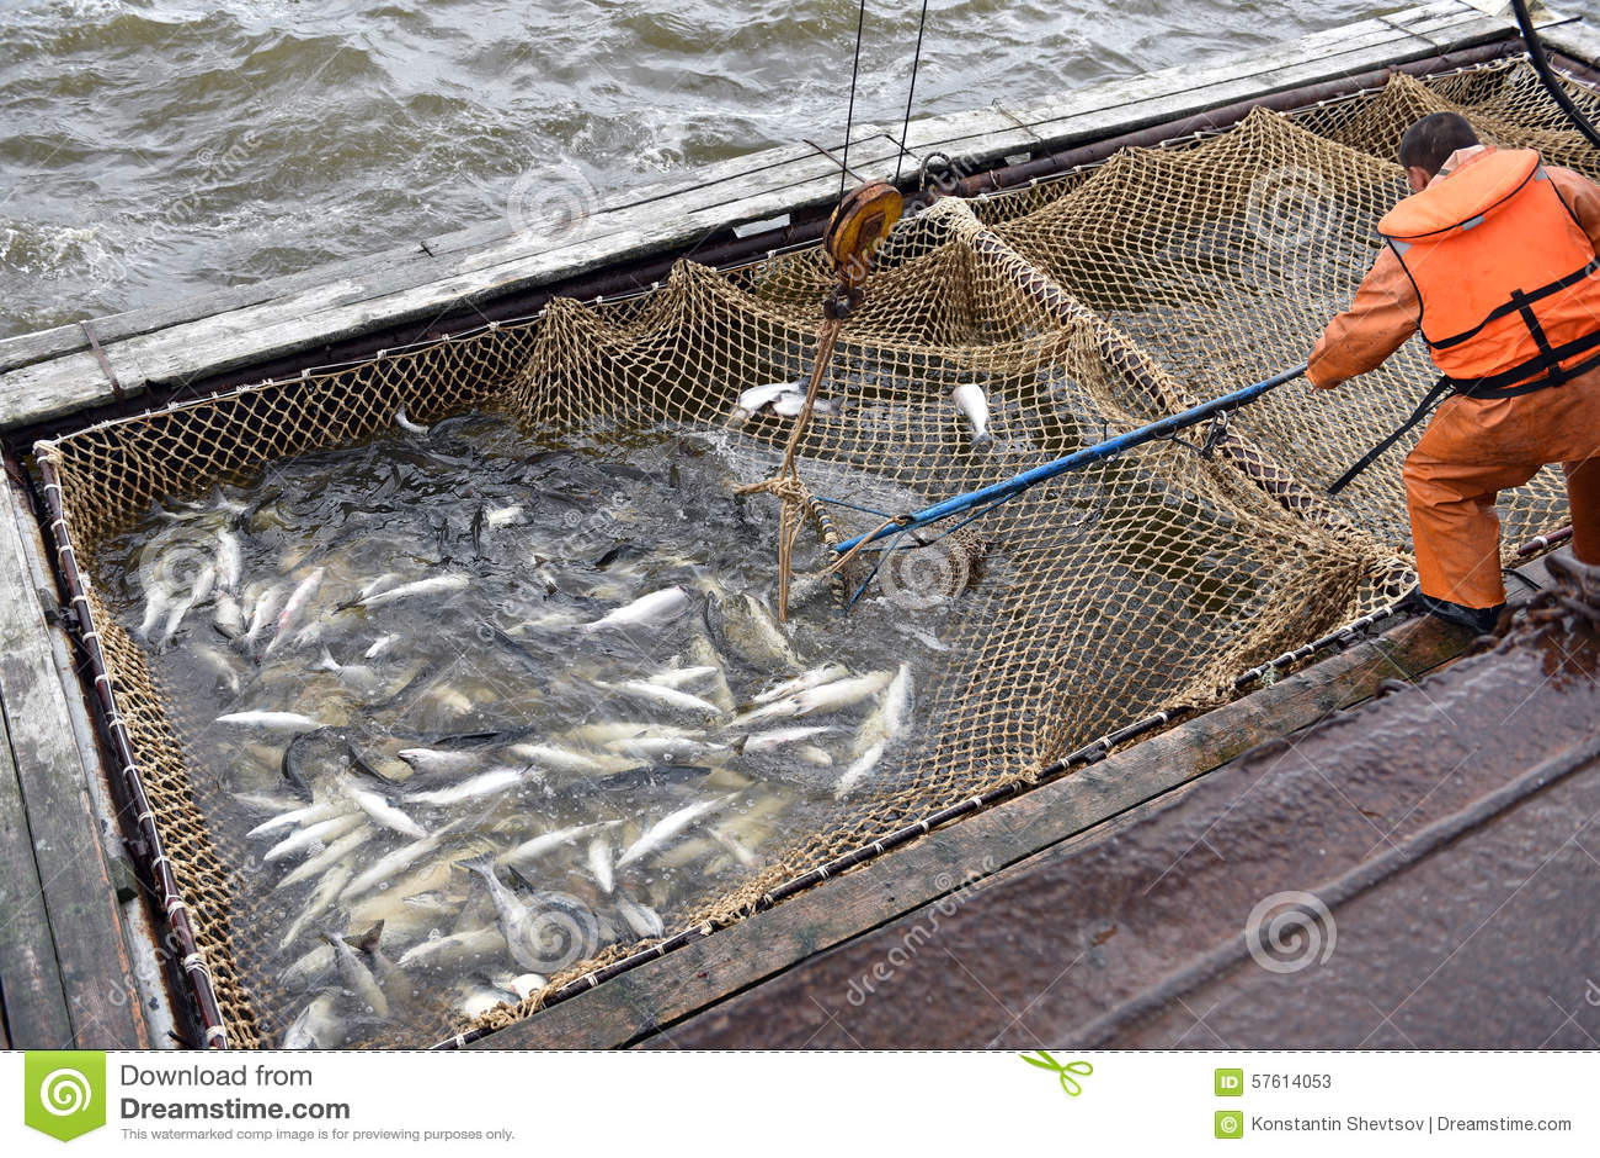 Salmon fishing season stock photo image 57614053 for Salmon fishing season